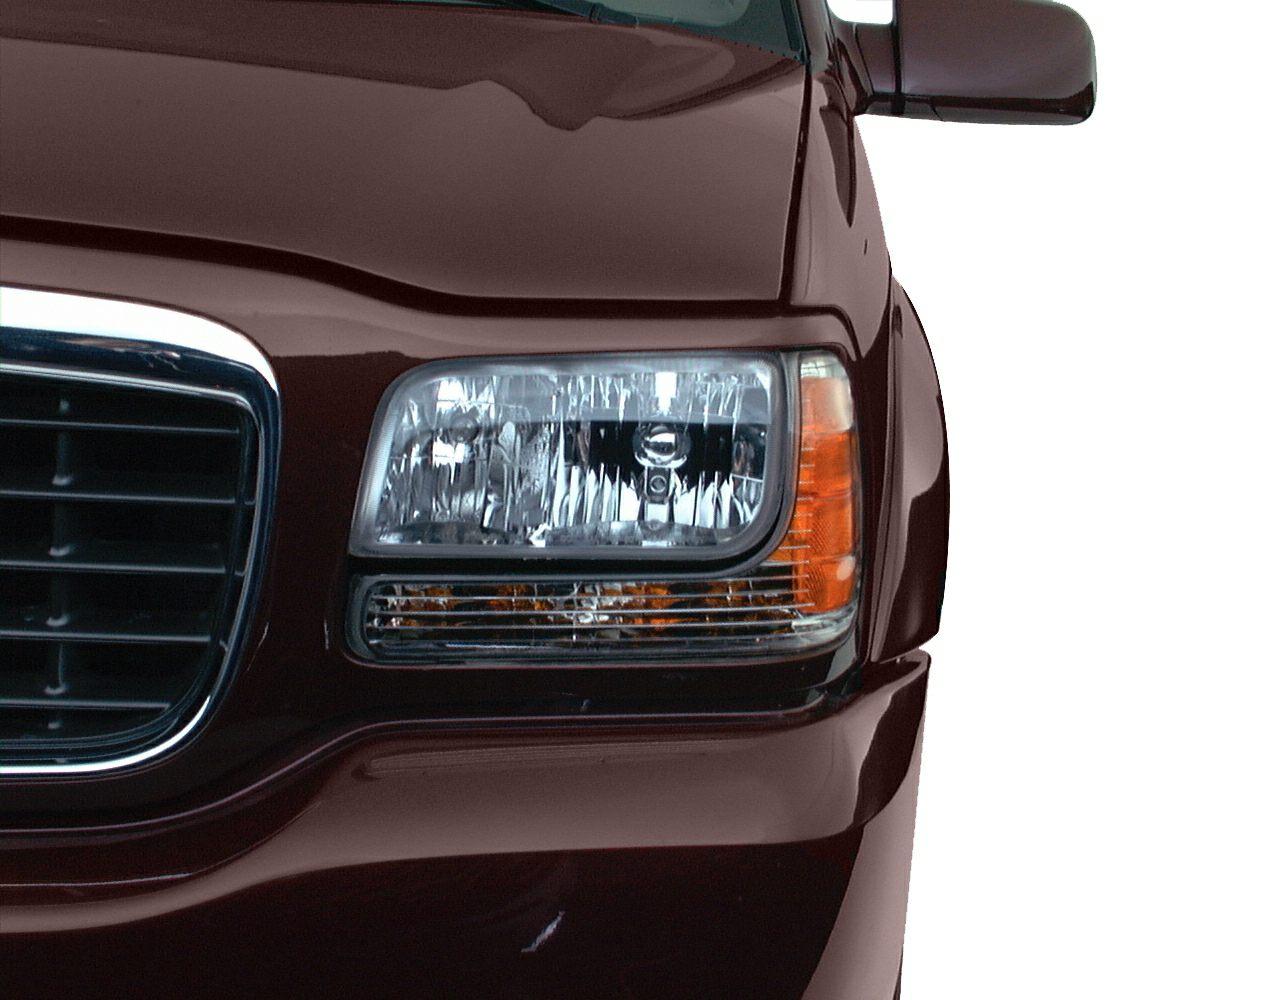 2000 Cadillac Escalade Base 4dr 4x4 Specs and Prices